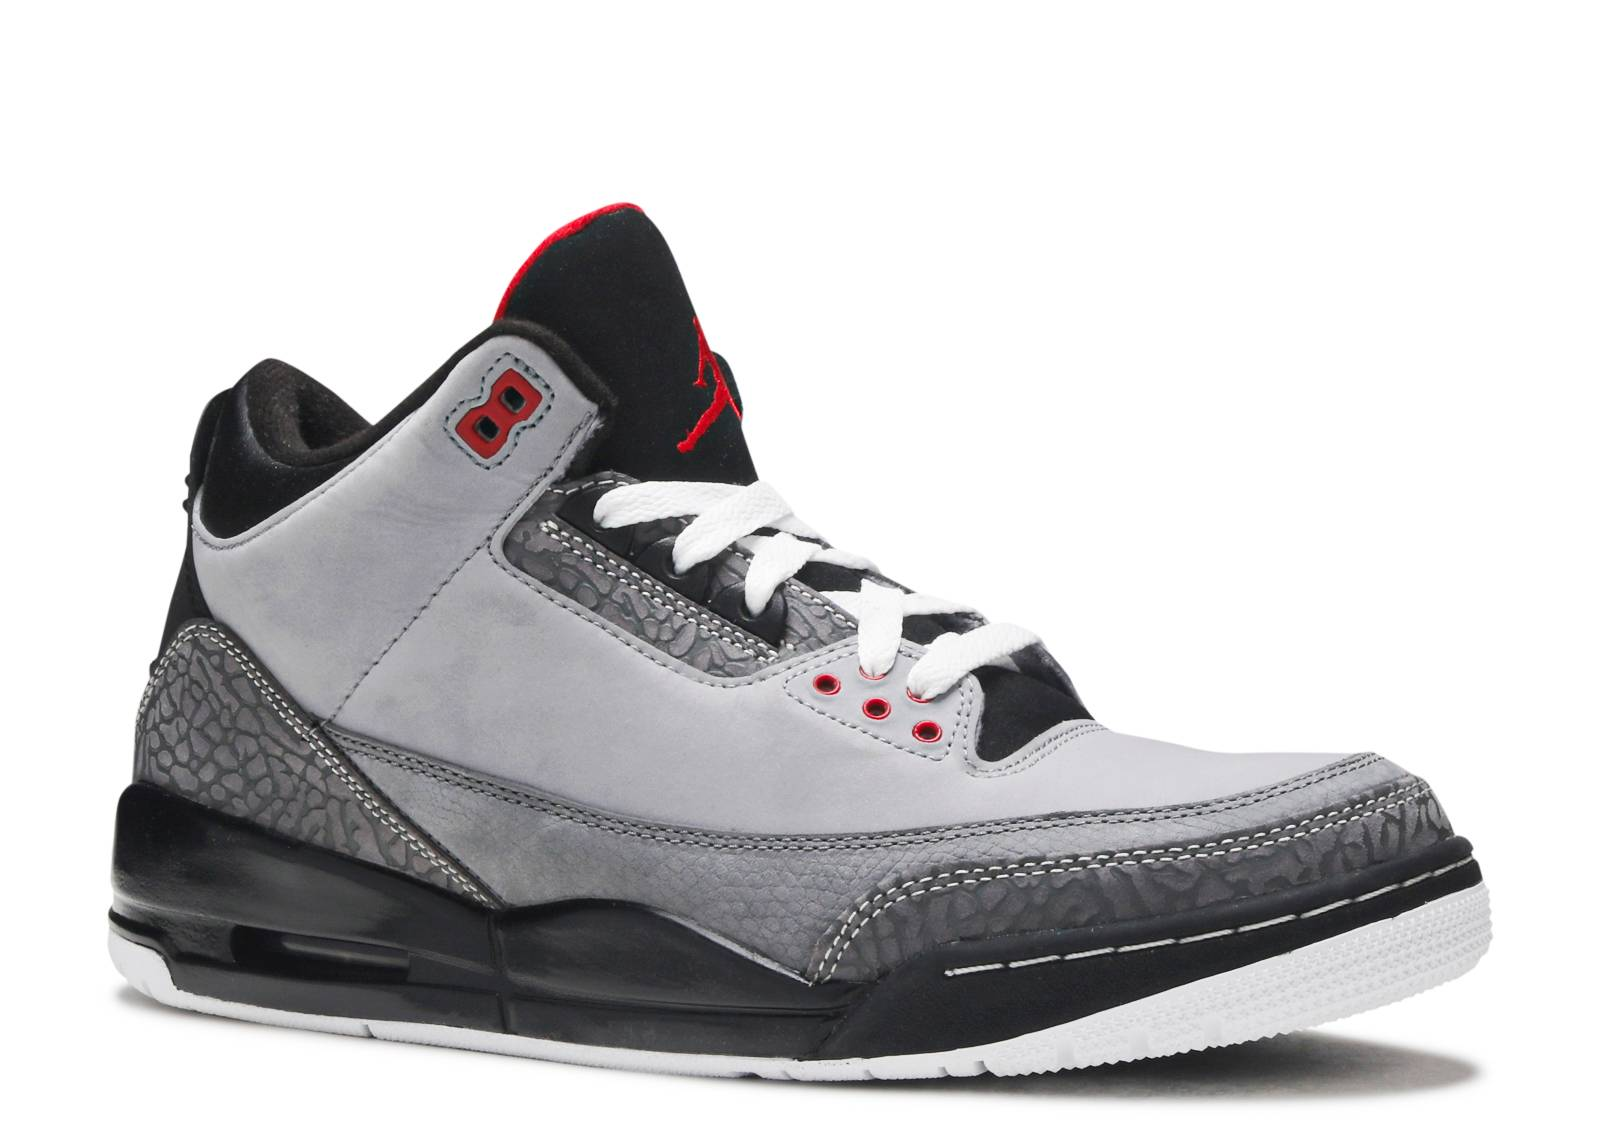 finest selection 25fd4 d4b47 Air Jordan 3 Retro